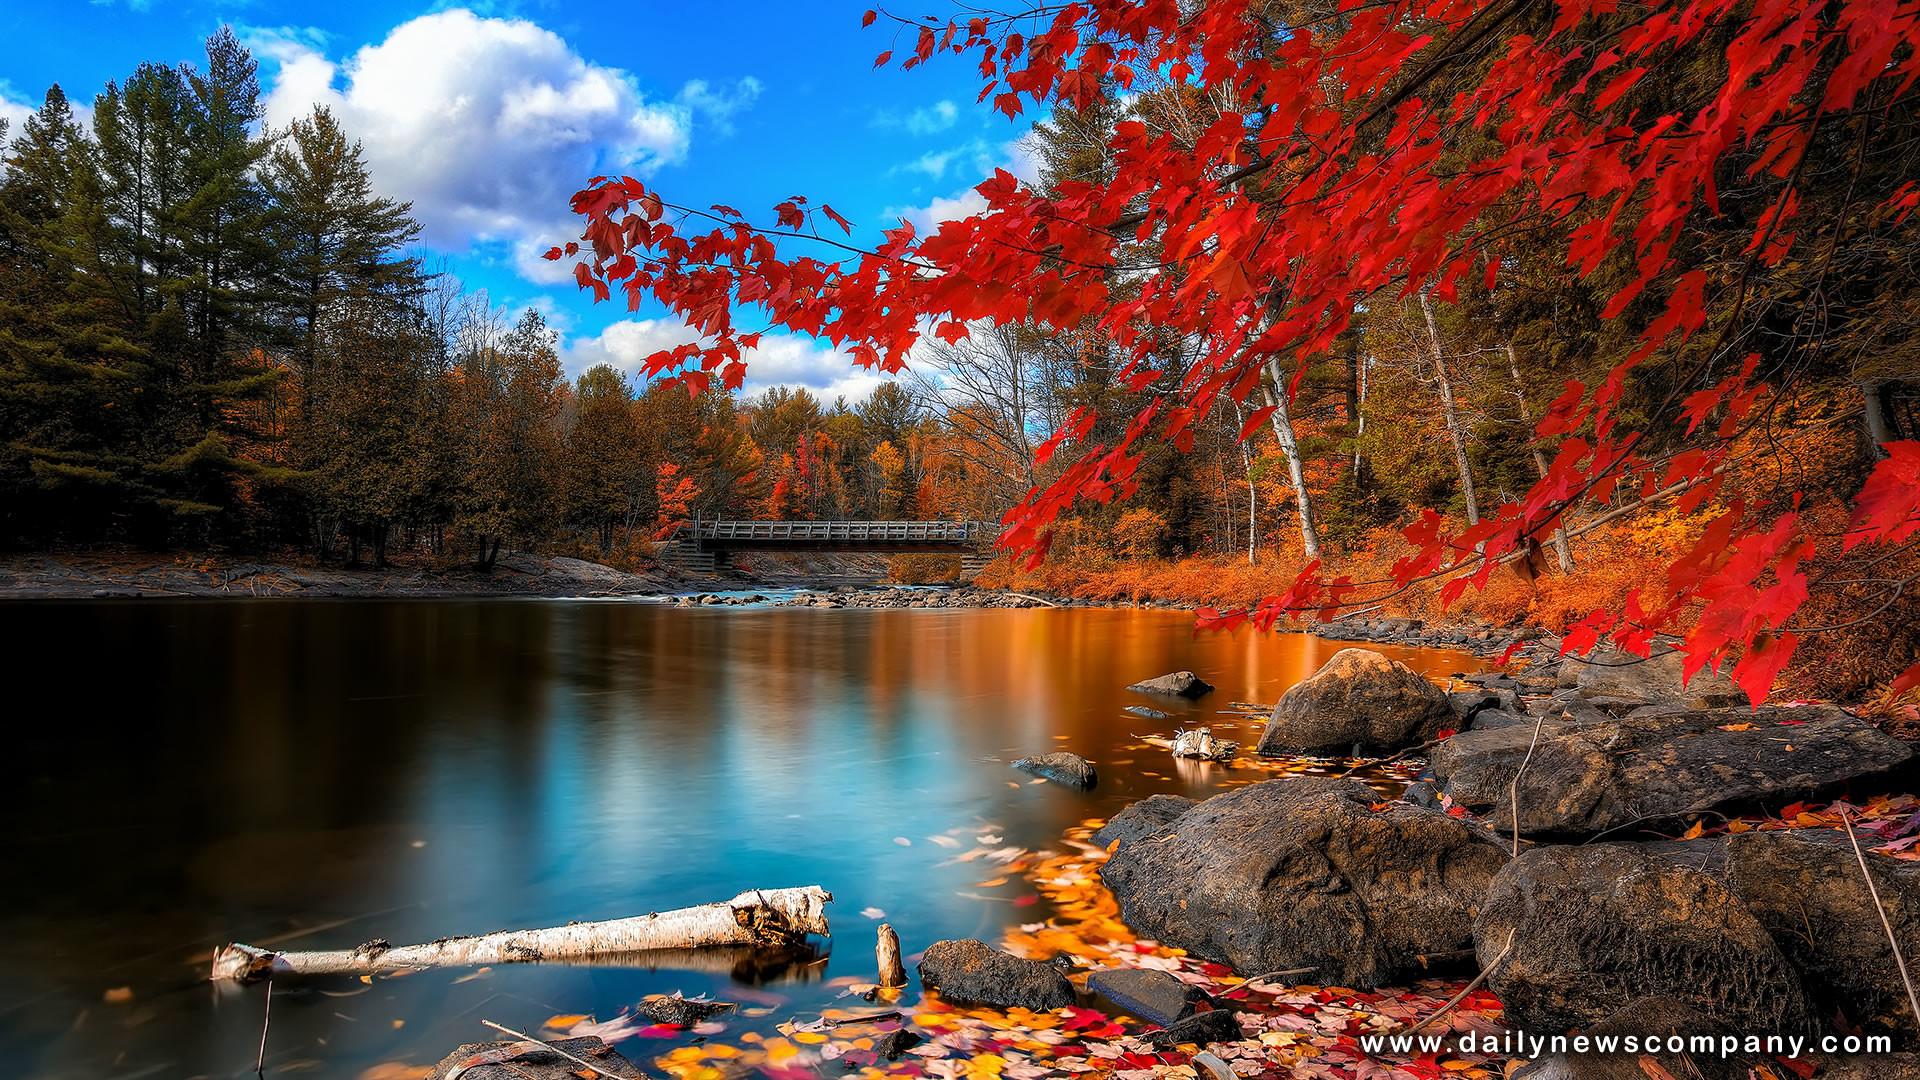 fall hd widescreen wallpaper (58+ images)